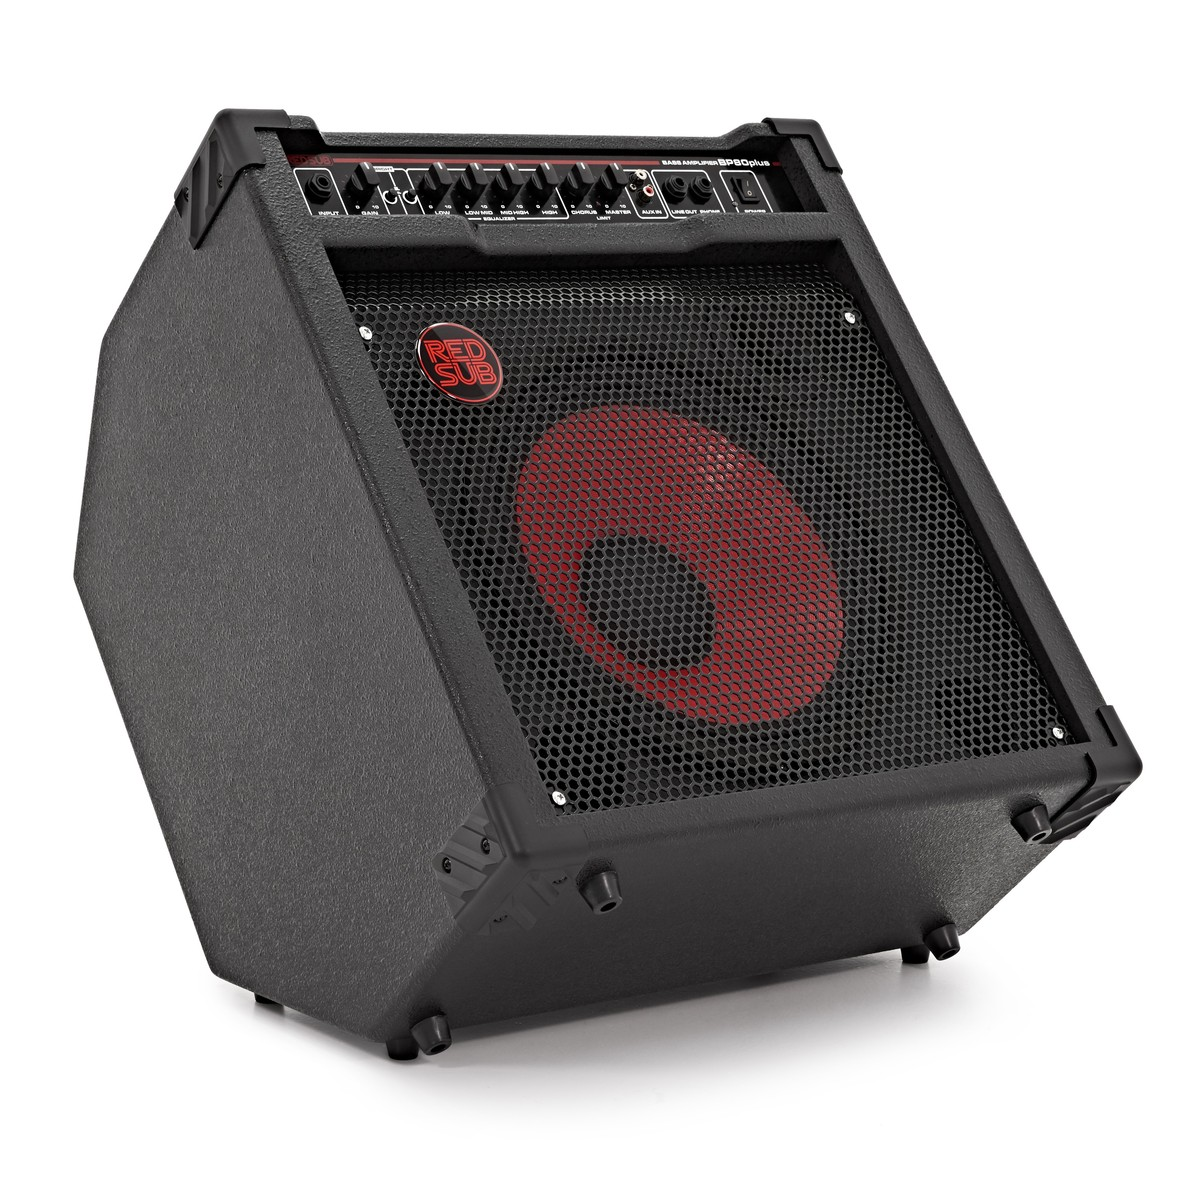 redsub bp80plus 80w bass guitar amplifier b stock at. Black Bedroom Furniture Sets. Home Design Ideas